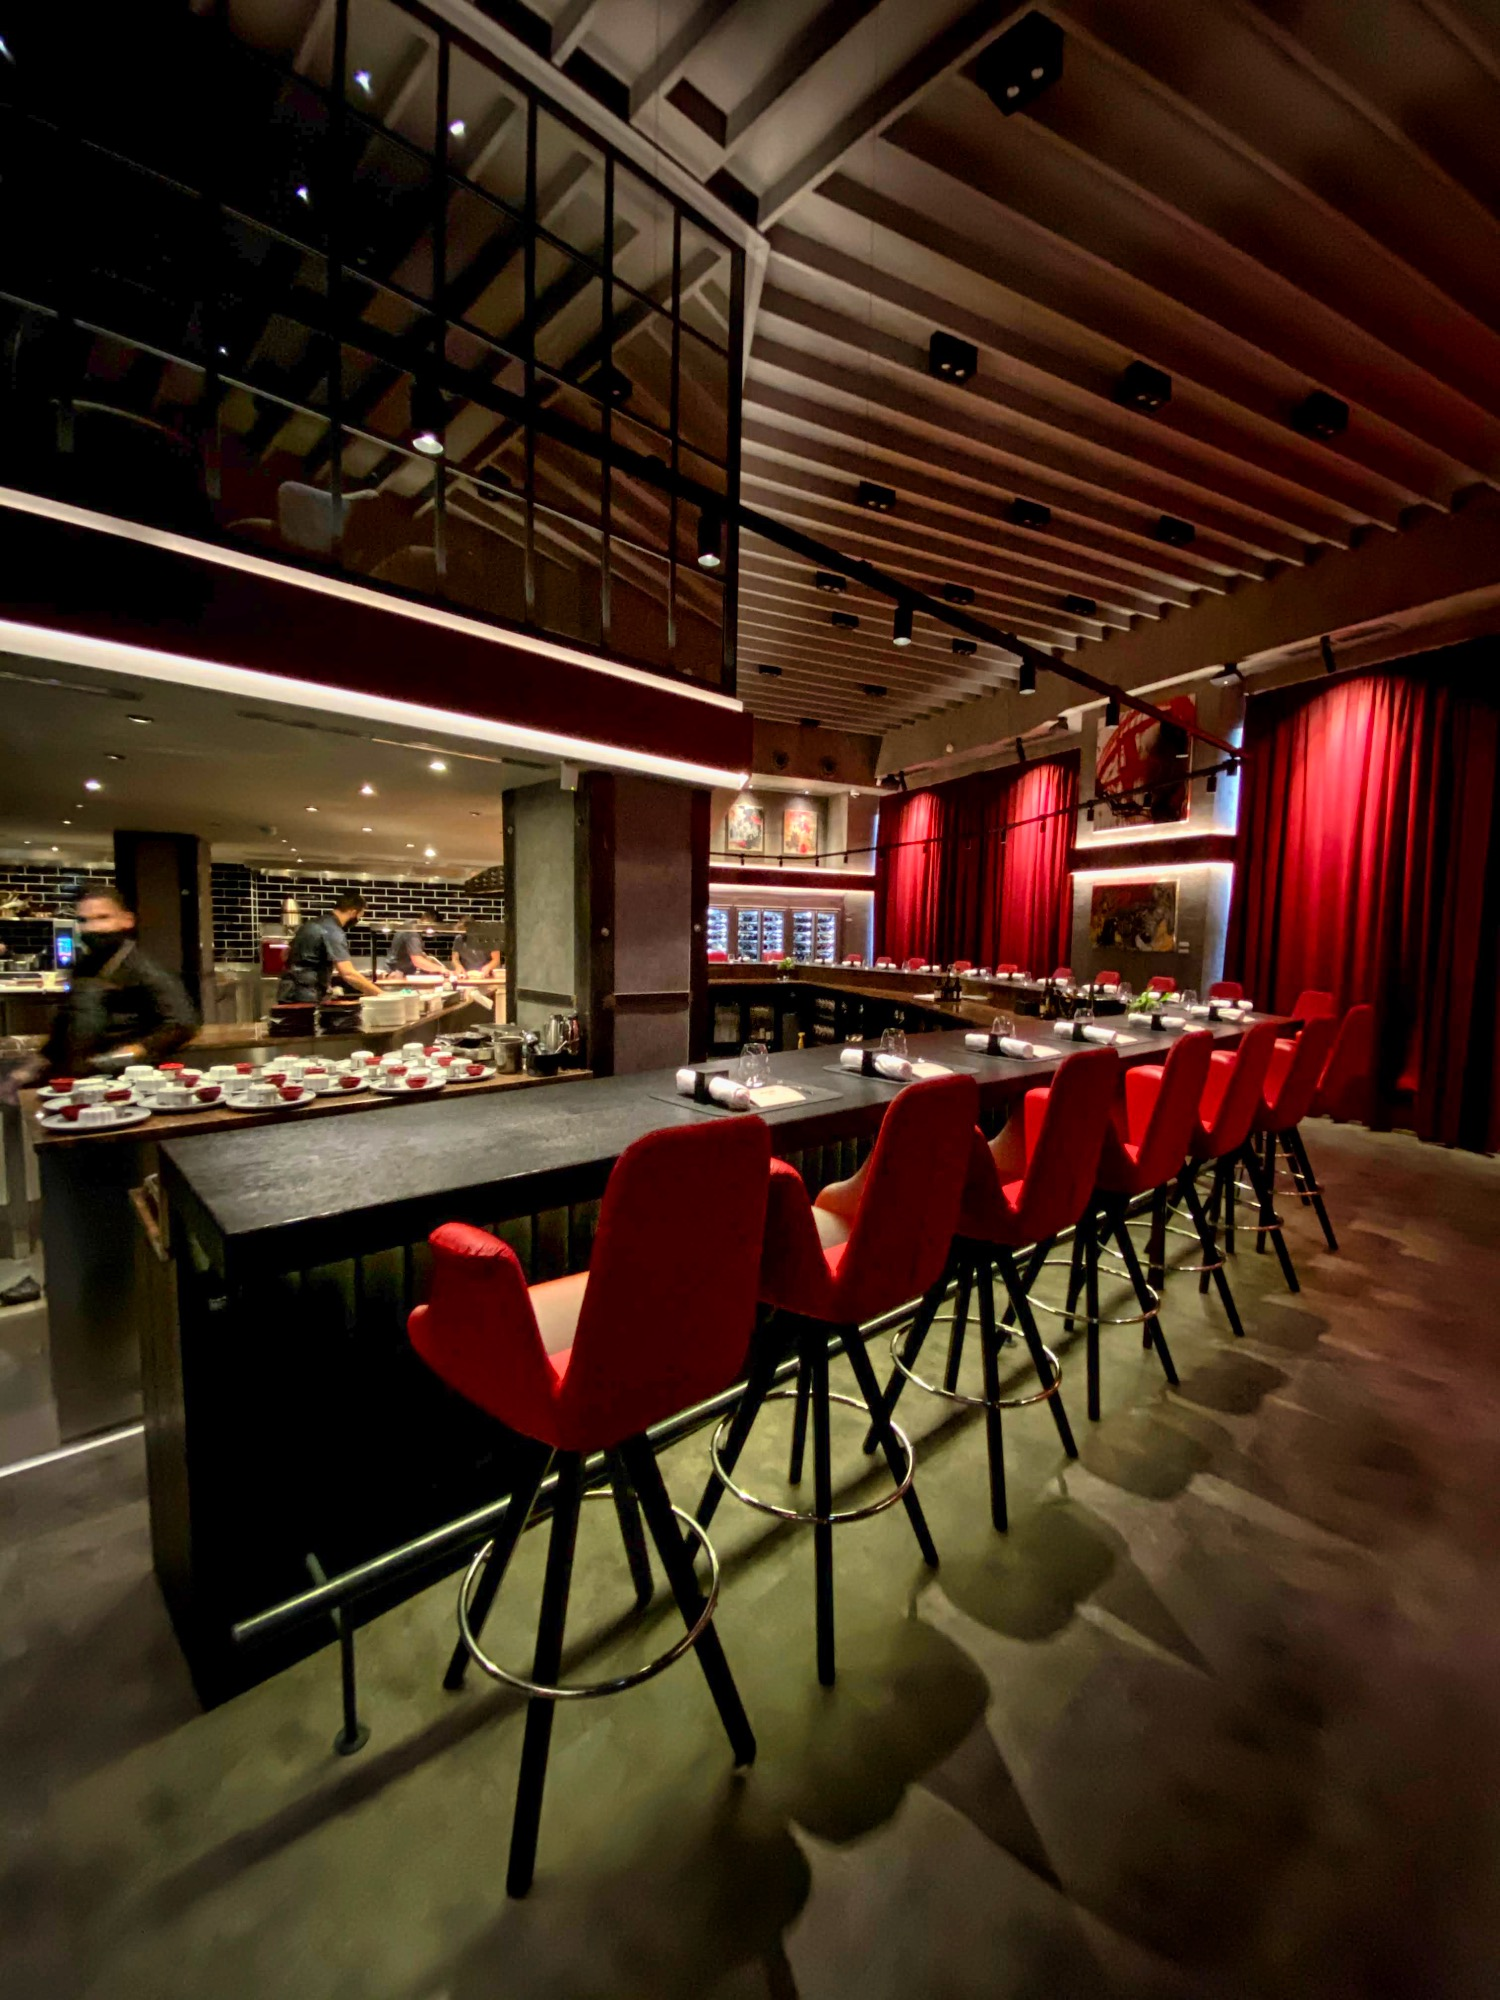 img_8444_rumour_racz_jeno_budapest_restaurant_jokuti_vilagevo_l_f.jpeg